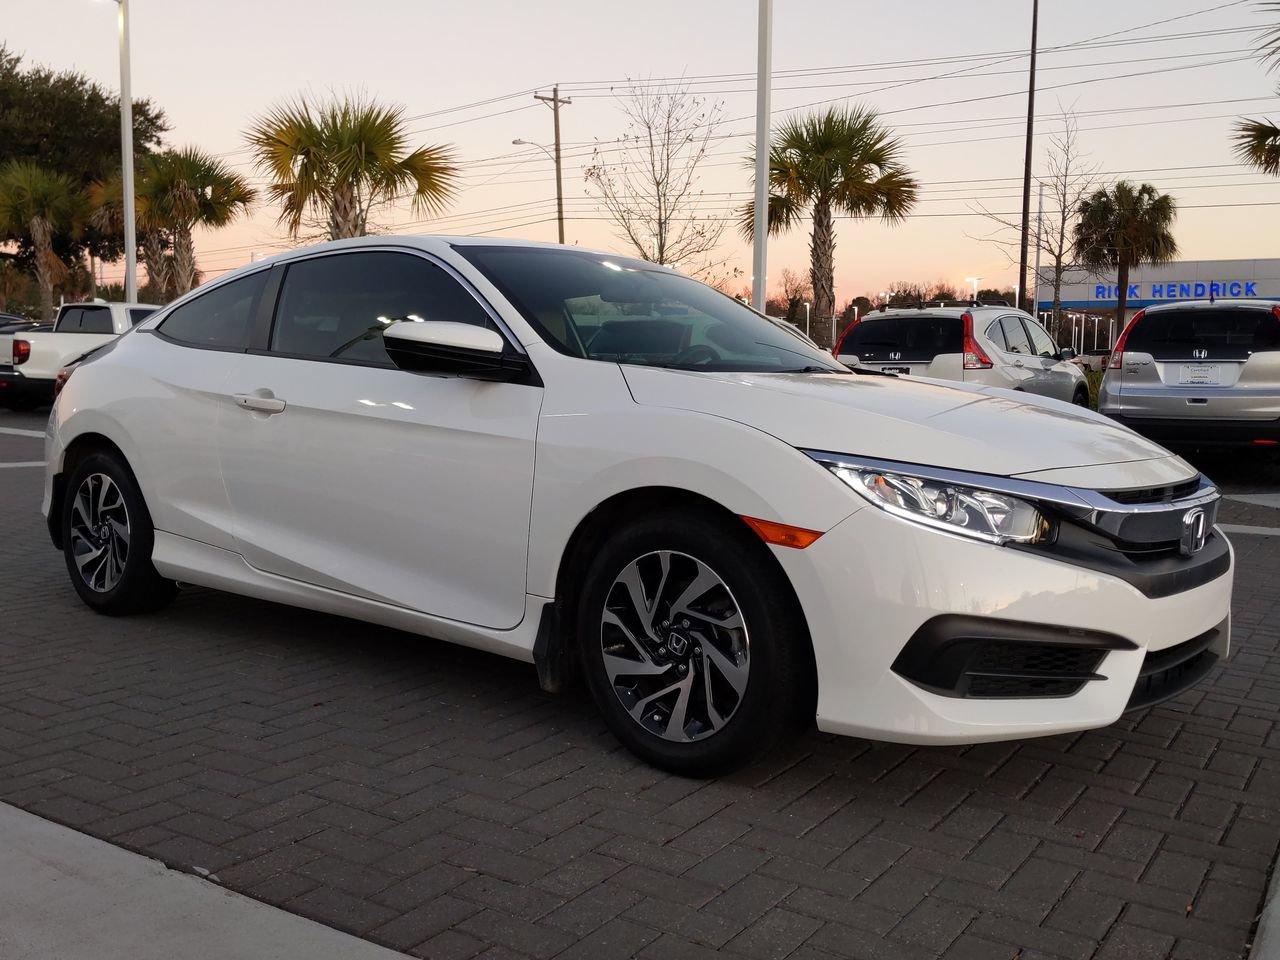 Pre-Owned 2018 Honda Civic LX-P